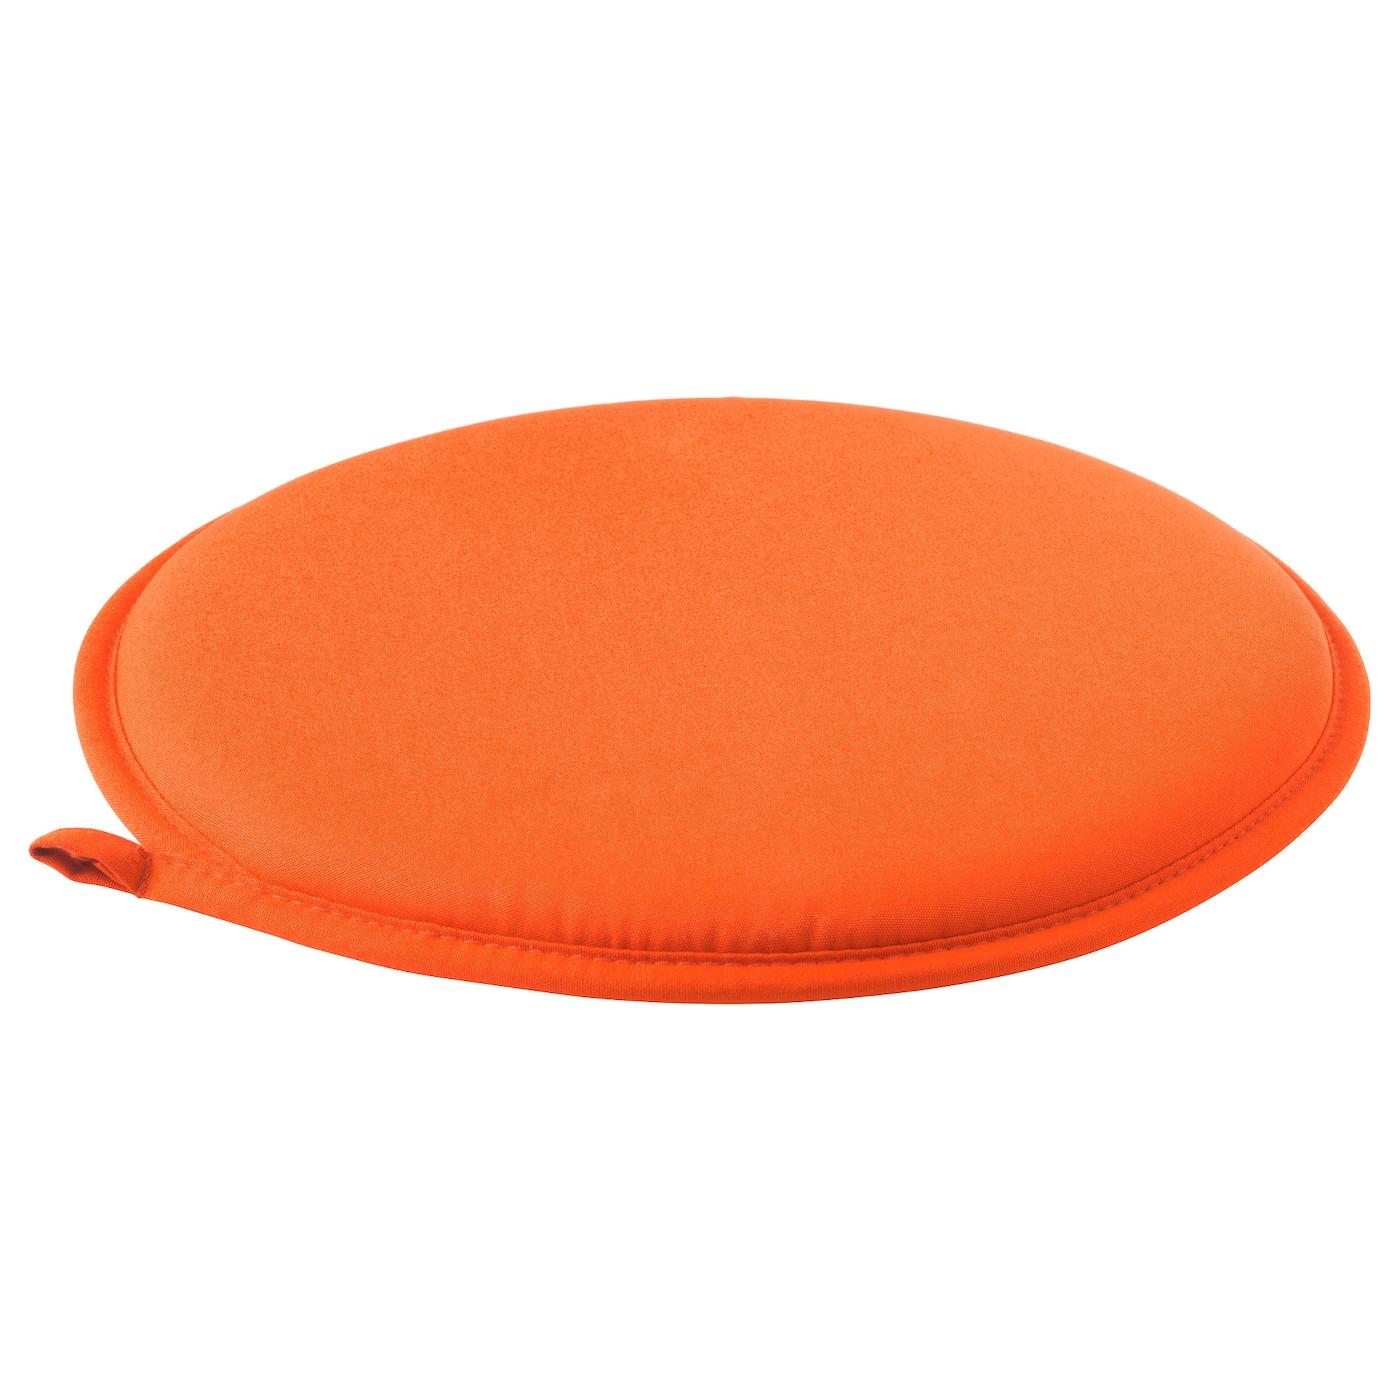 cilla carreau de chaise orange 34 cm ikea. Black Bedroom Furniture Sets. Home Design Ideas